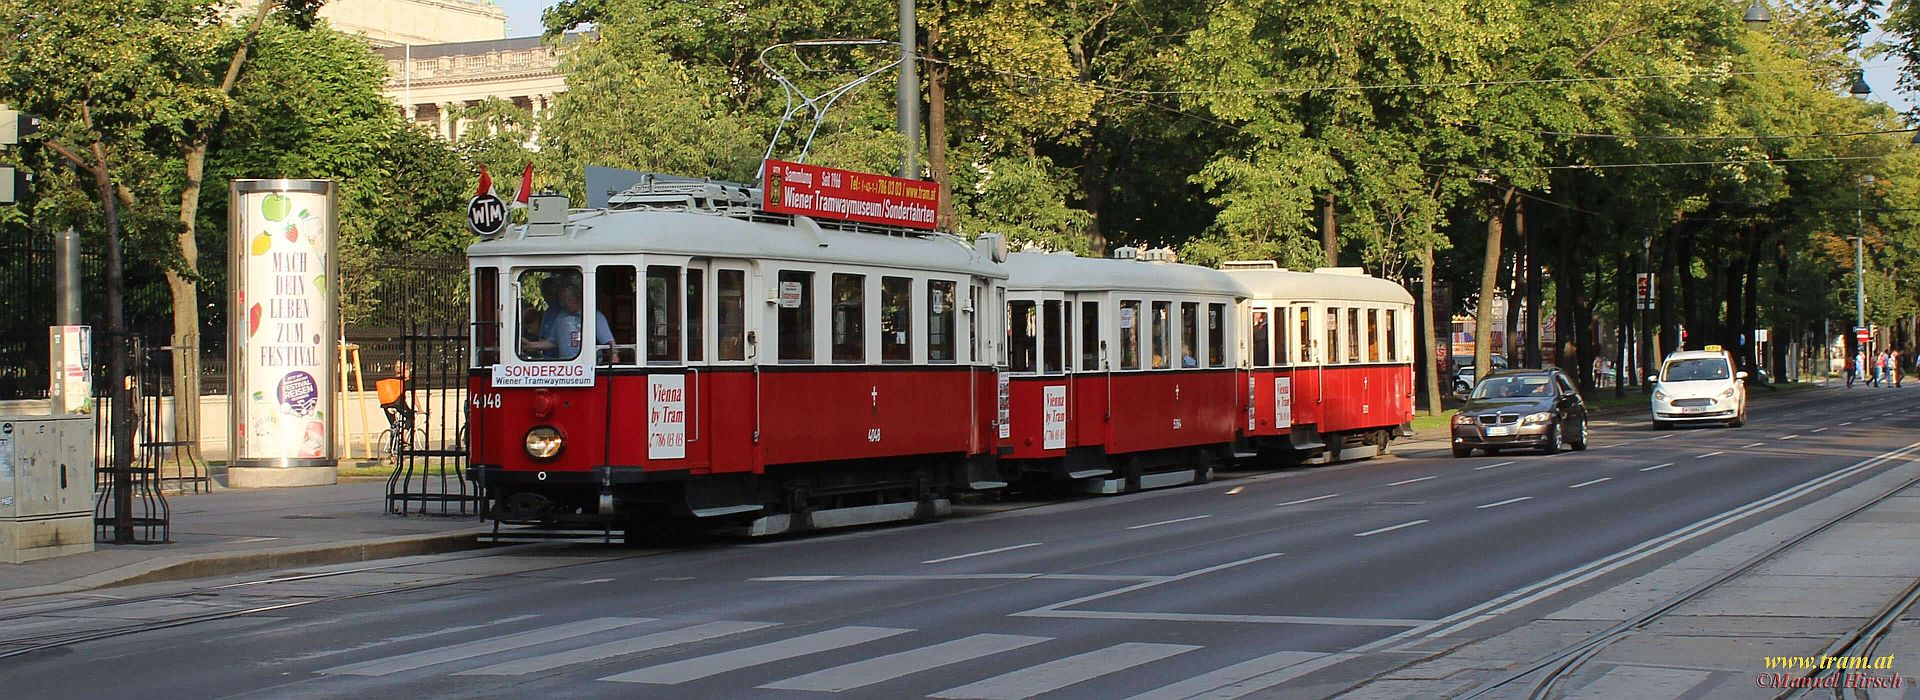 Dreiwagenzug 4148 + 5364 + 5417 am Ring